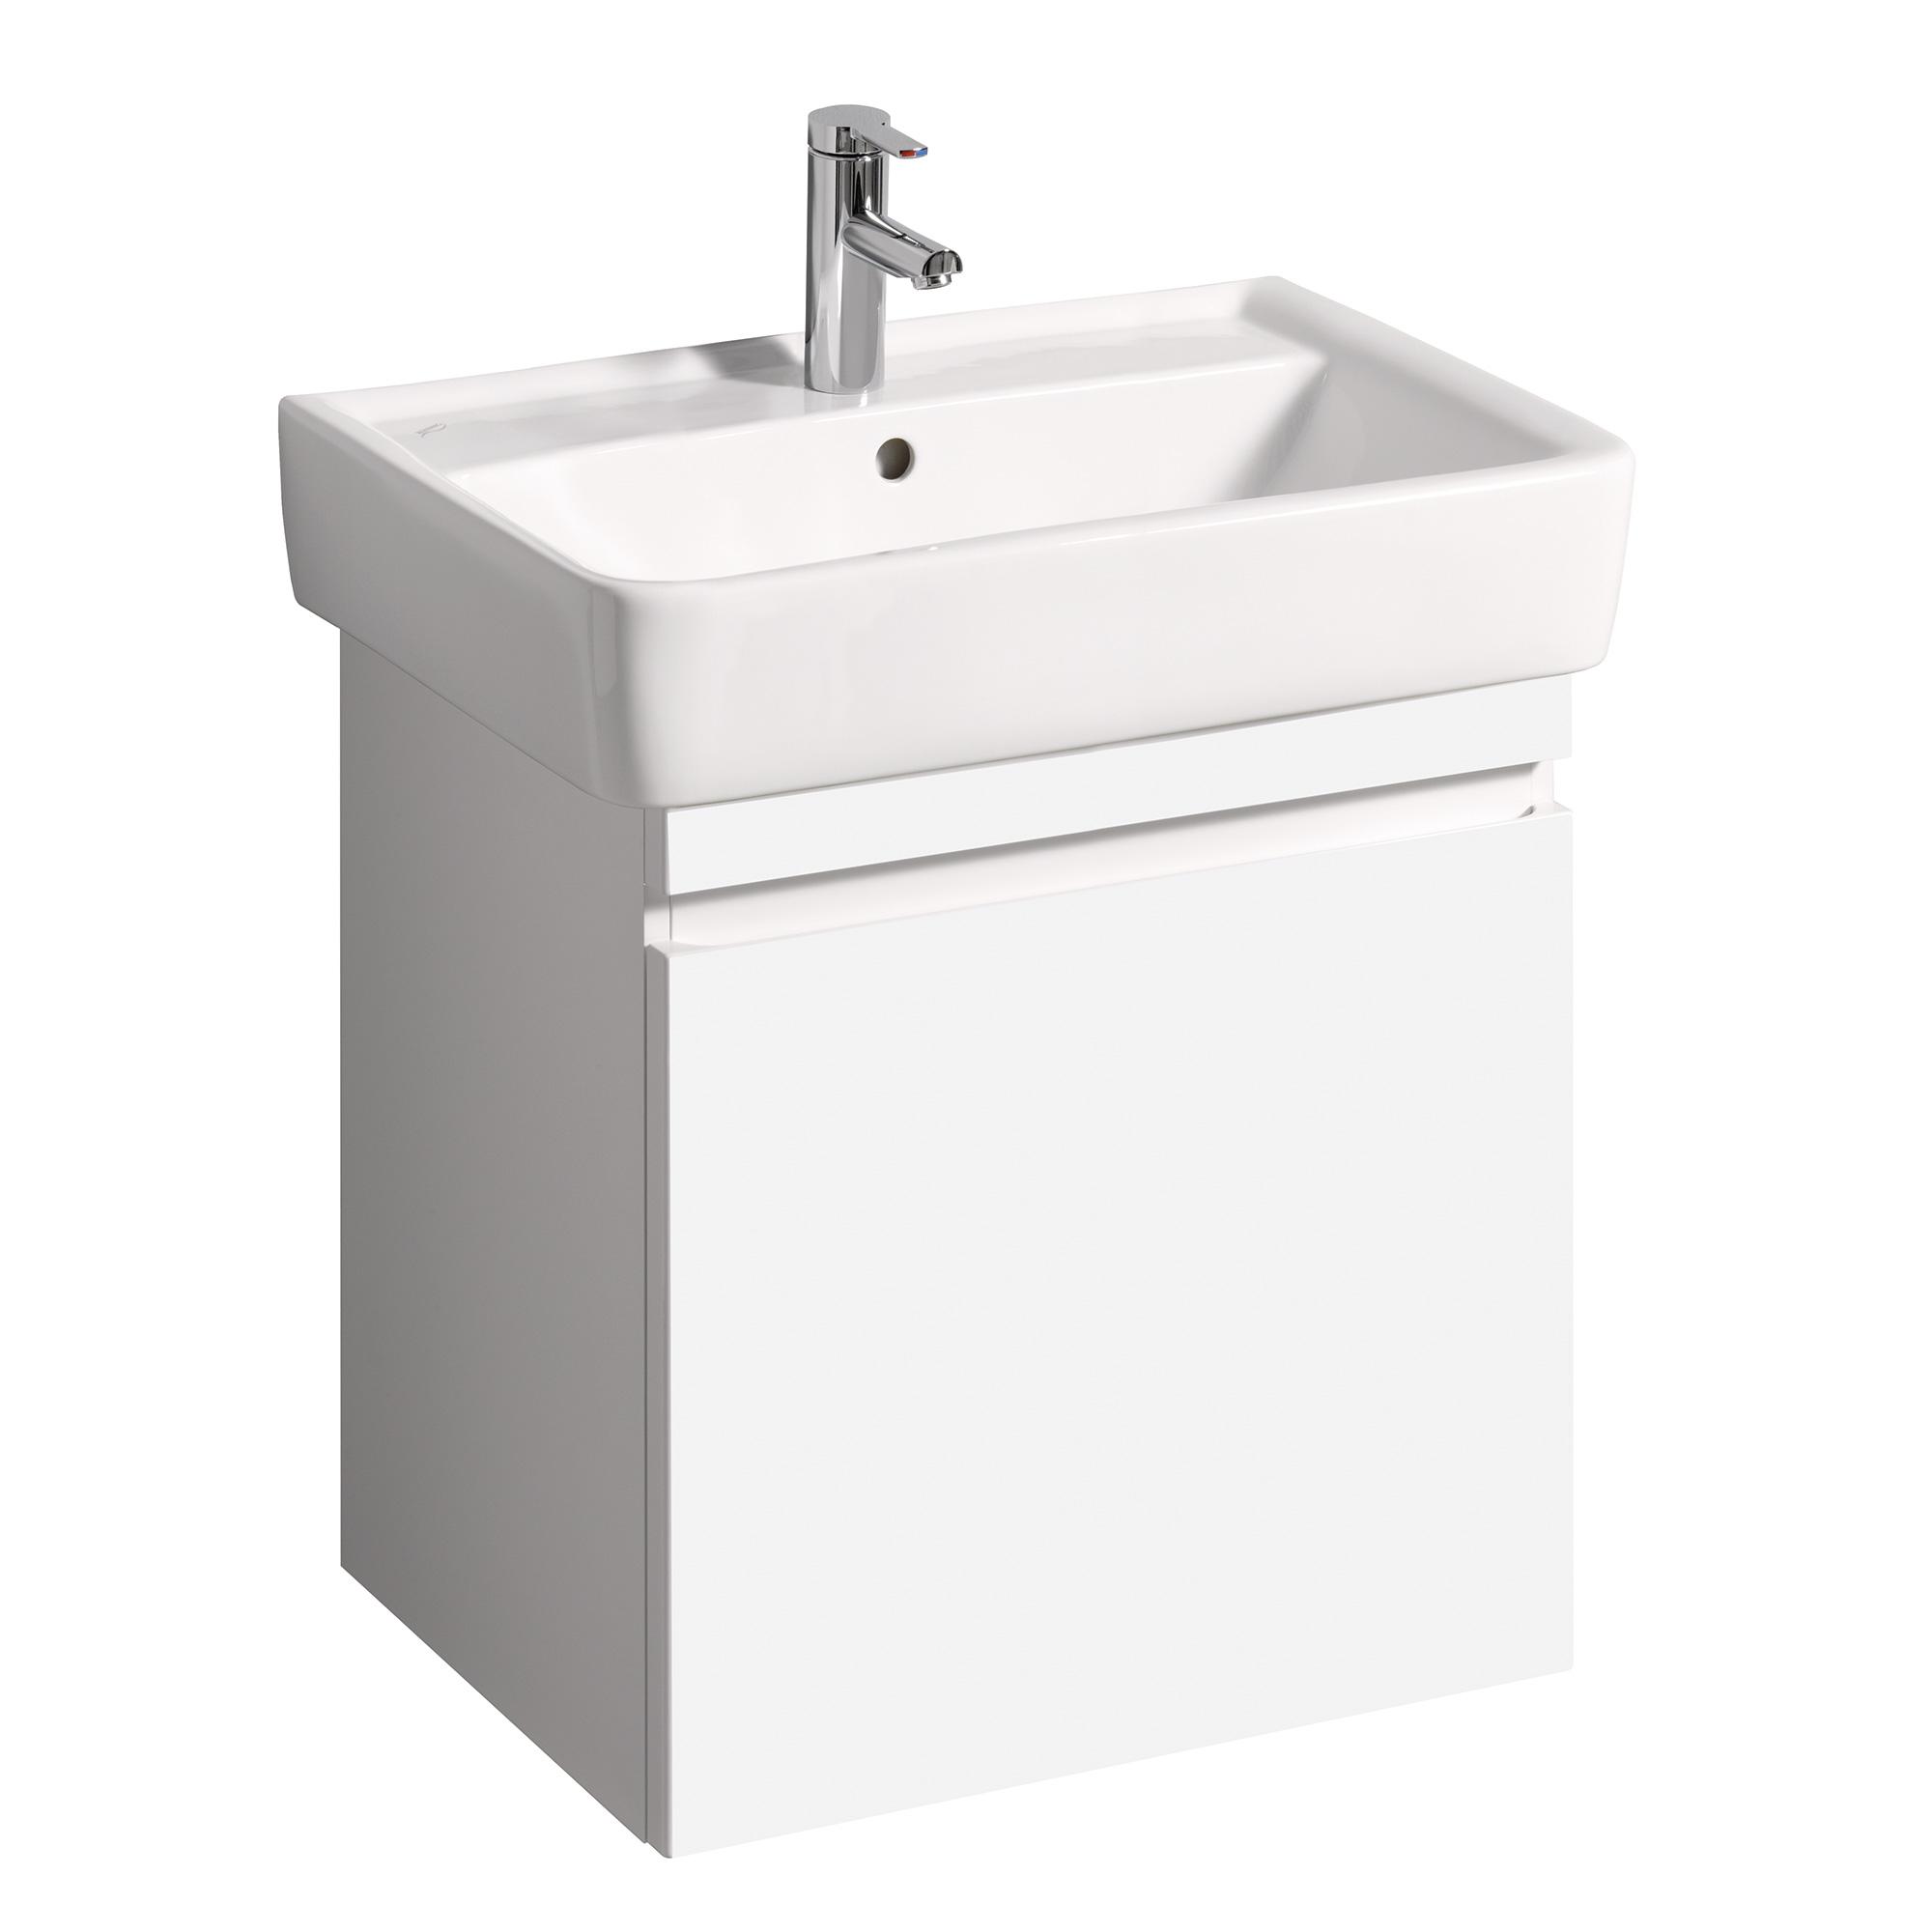 keramag renova nr 1 plan waschtischunterschrank b 57 6 h. Black Bedroom Furniture Sets. Home Design Ideas